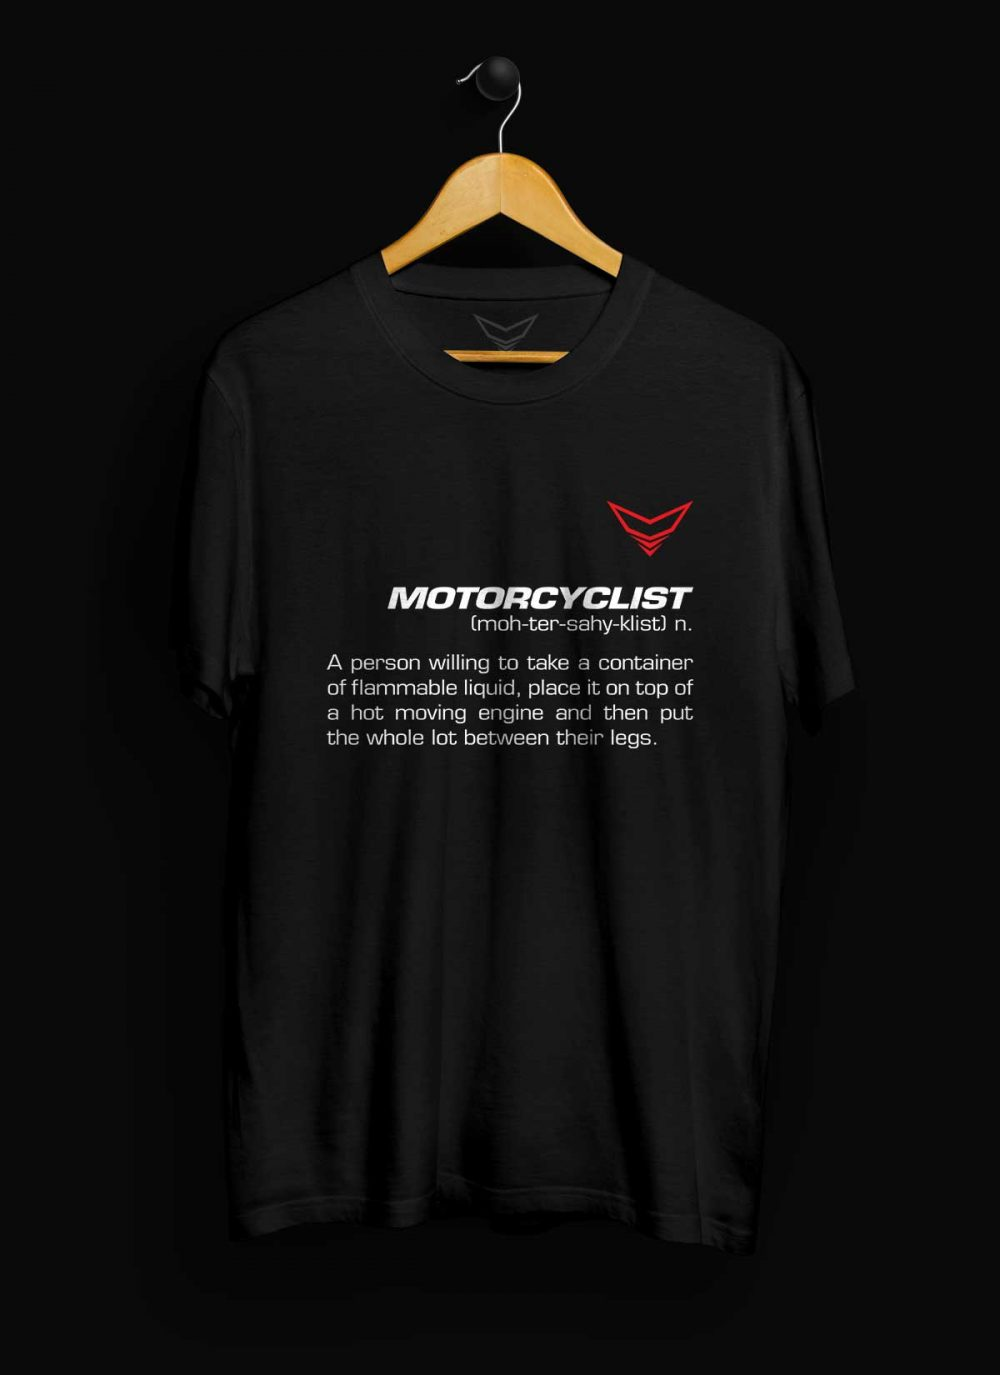 Motorcyclist Definition T-Shirt